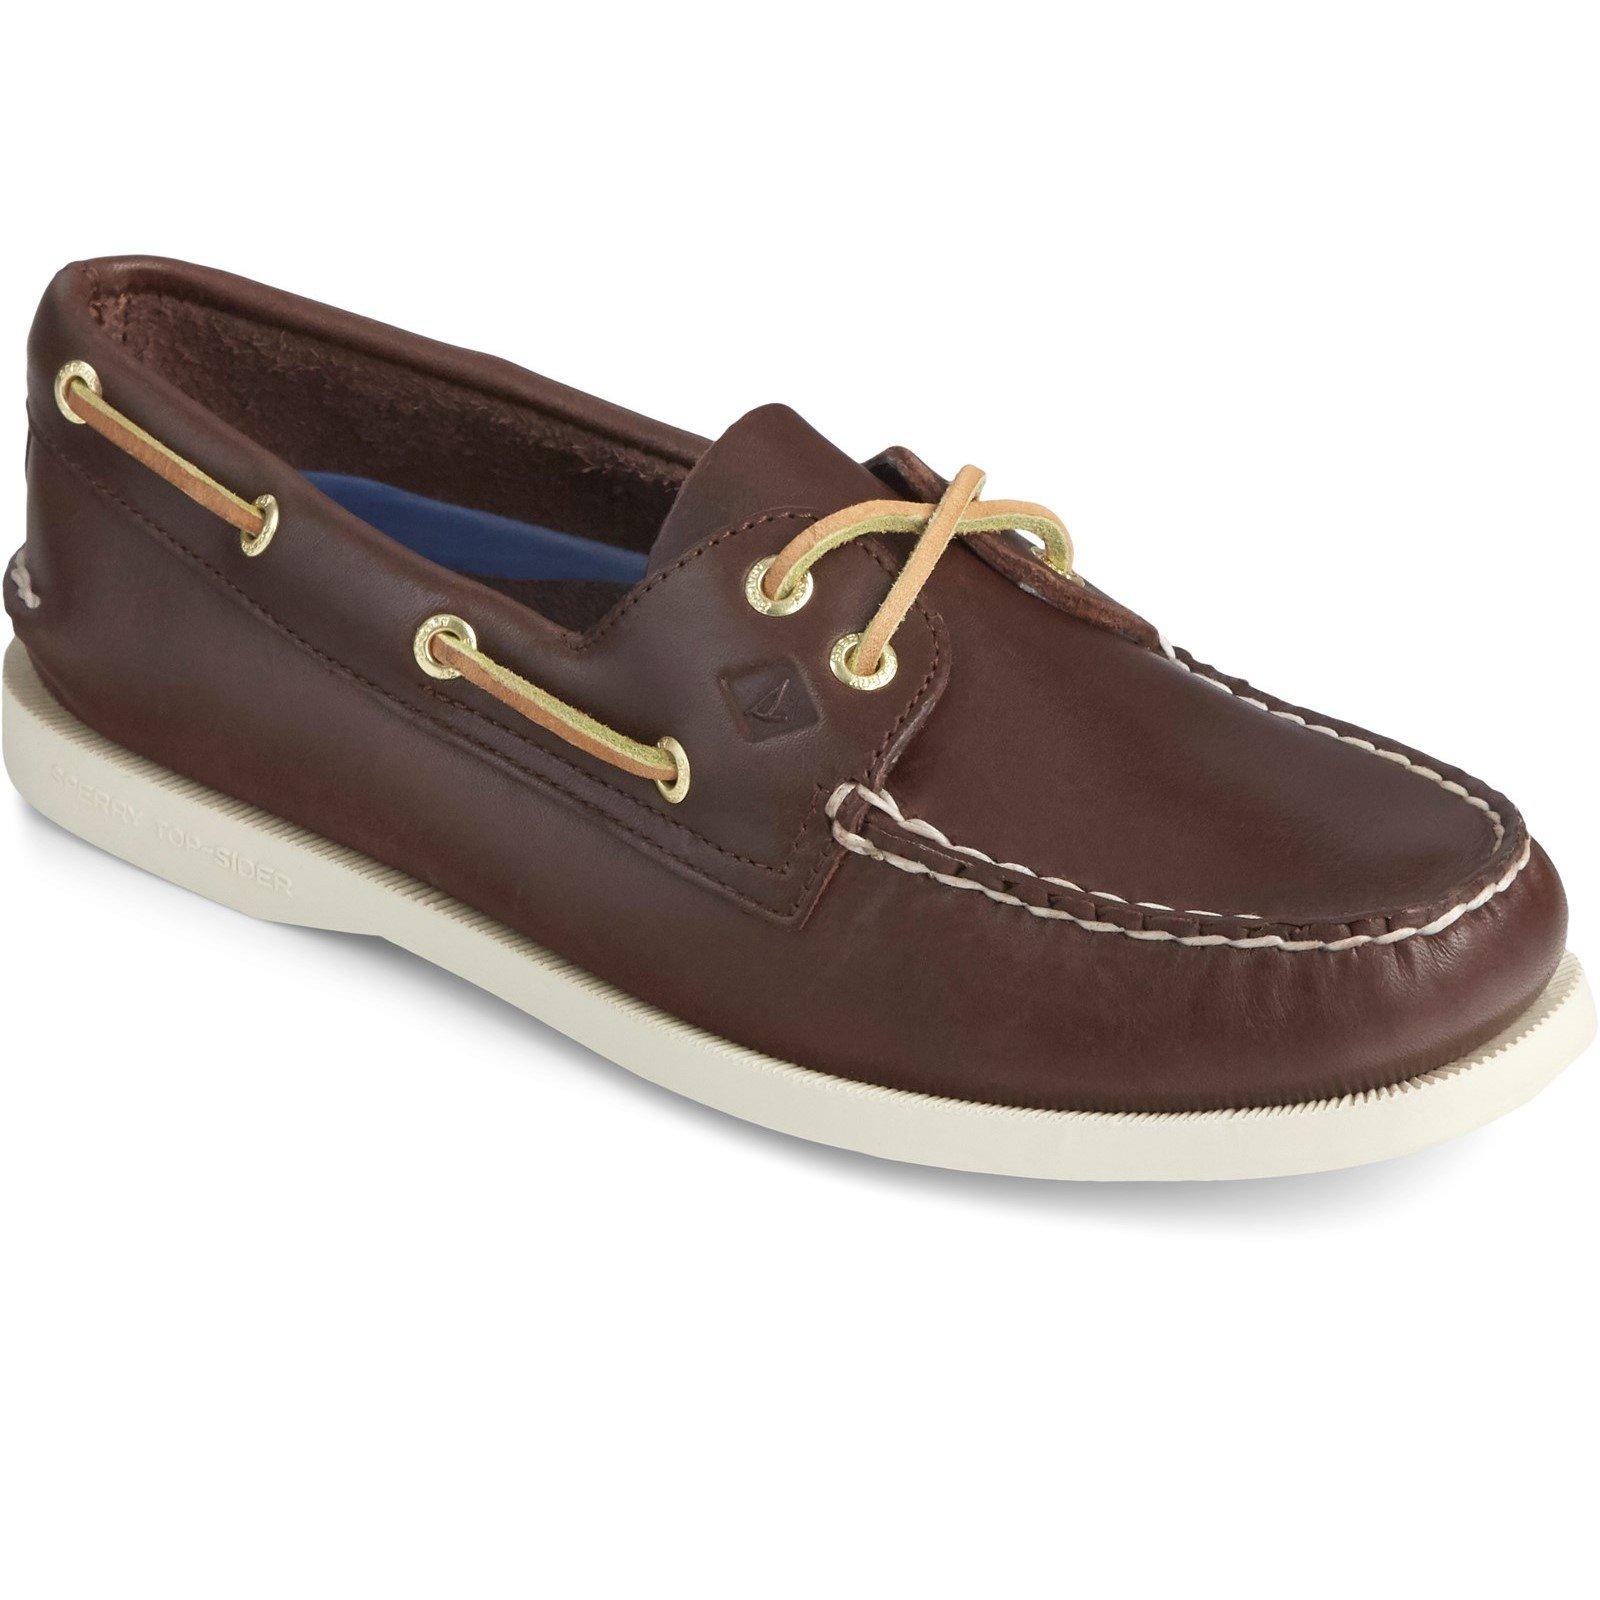 Sperry Women's Authentic Original Boat Shoe Various Colours 31535 - Brown 6